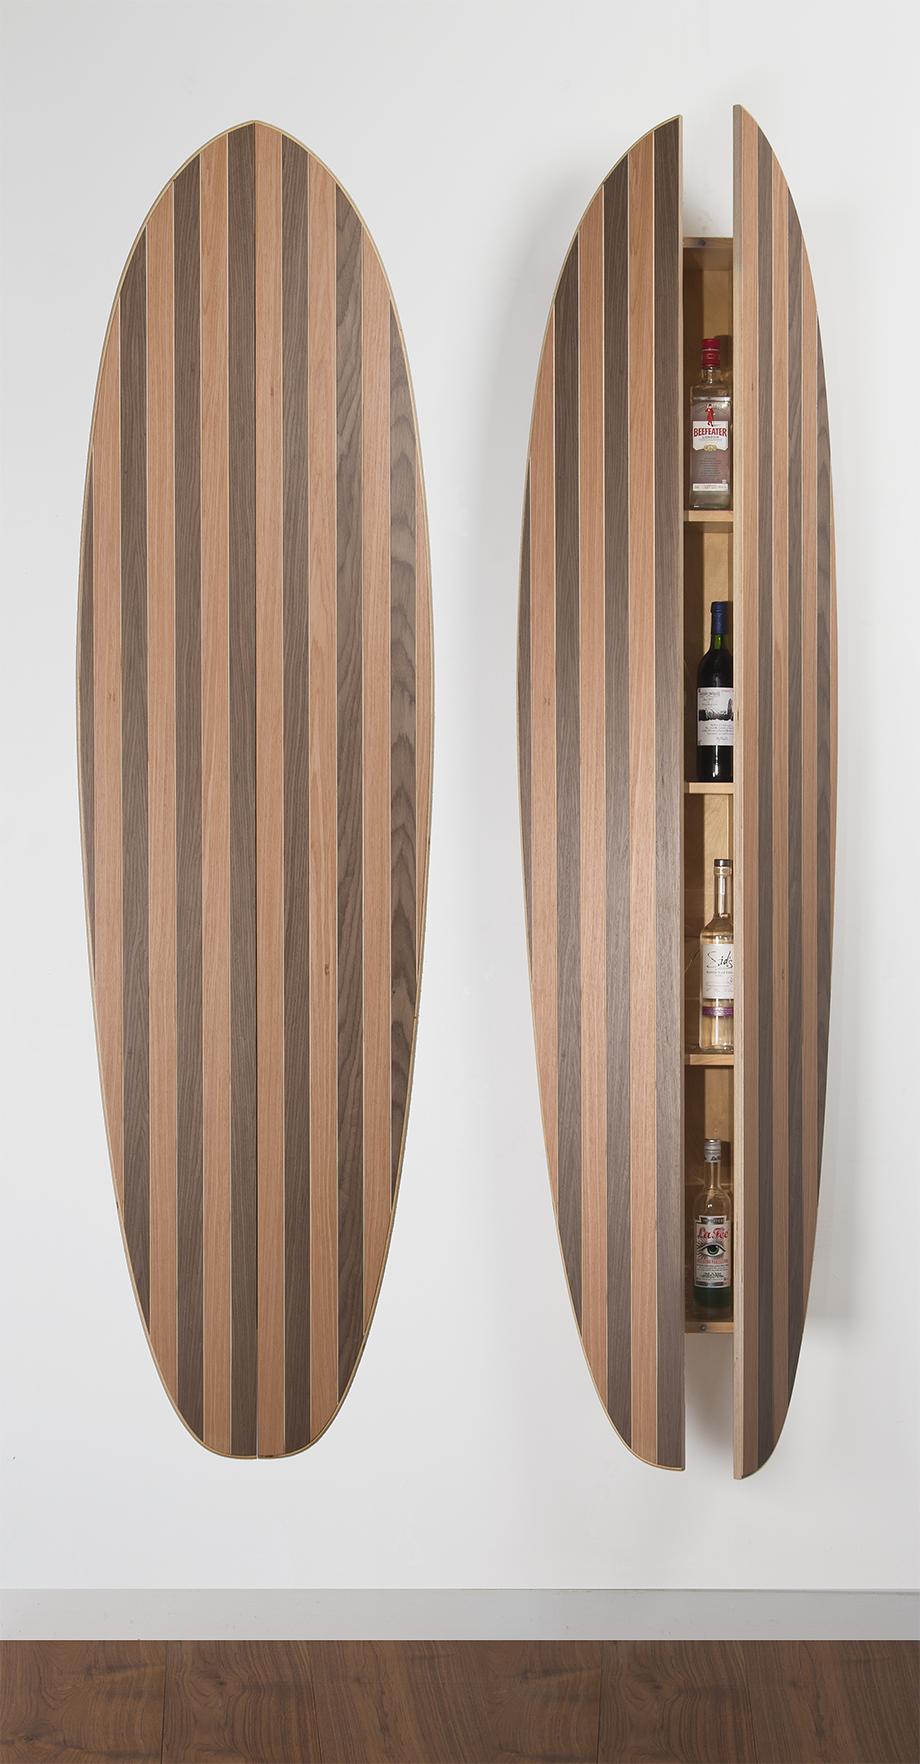 Surf Cabinet, 2018